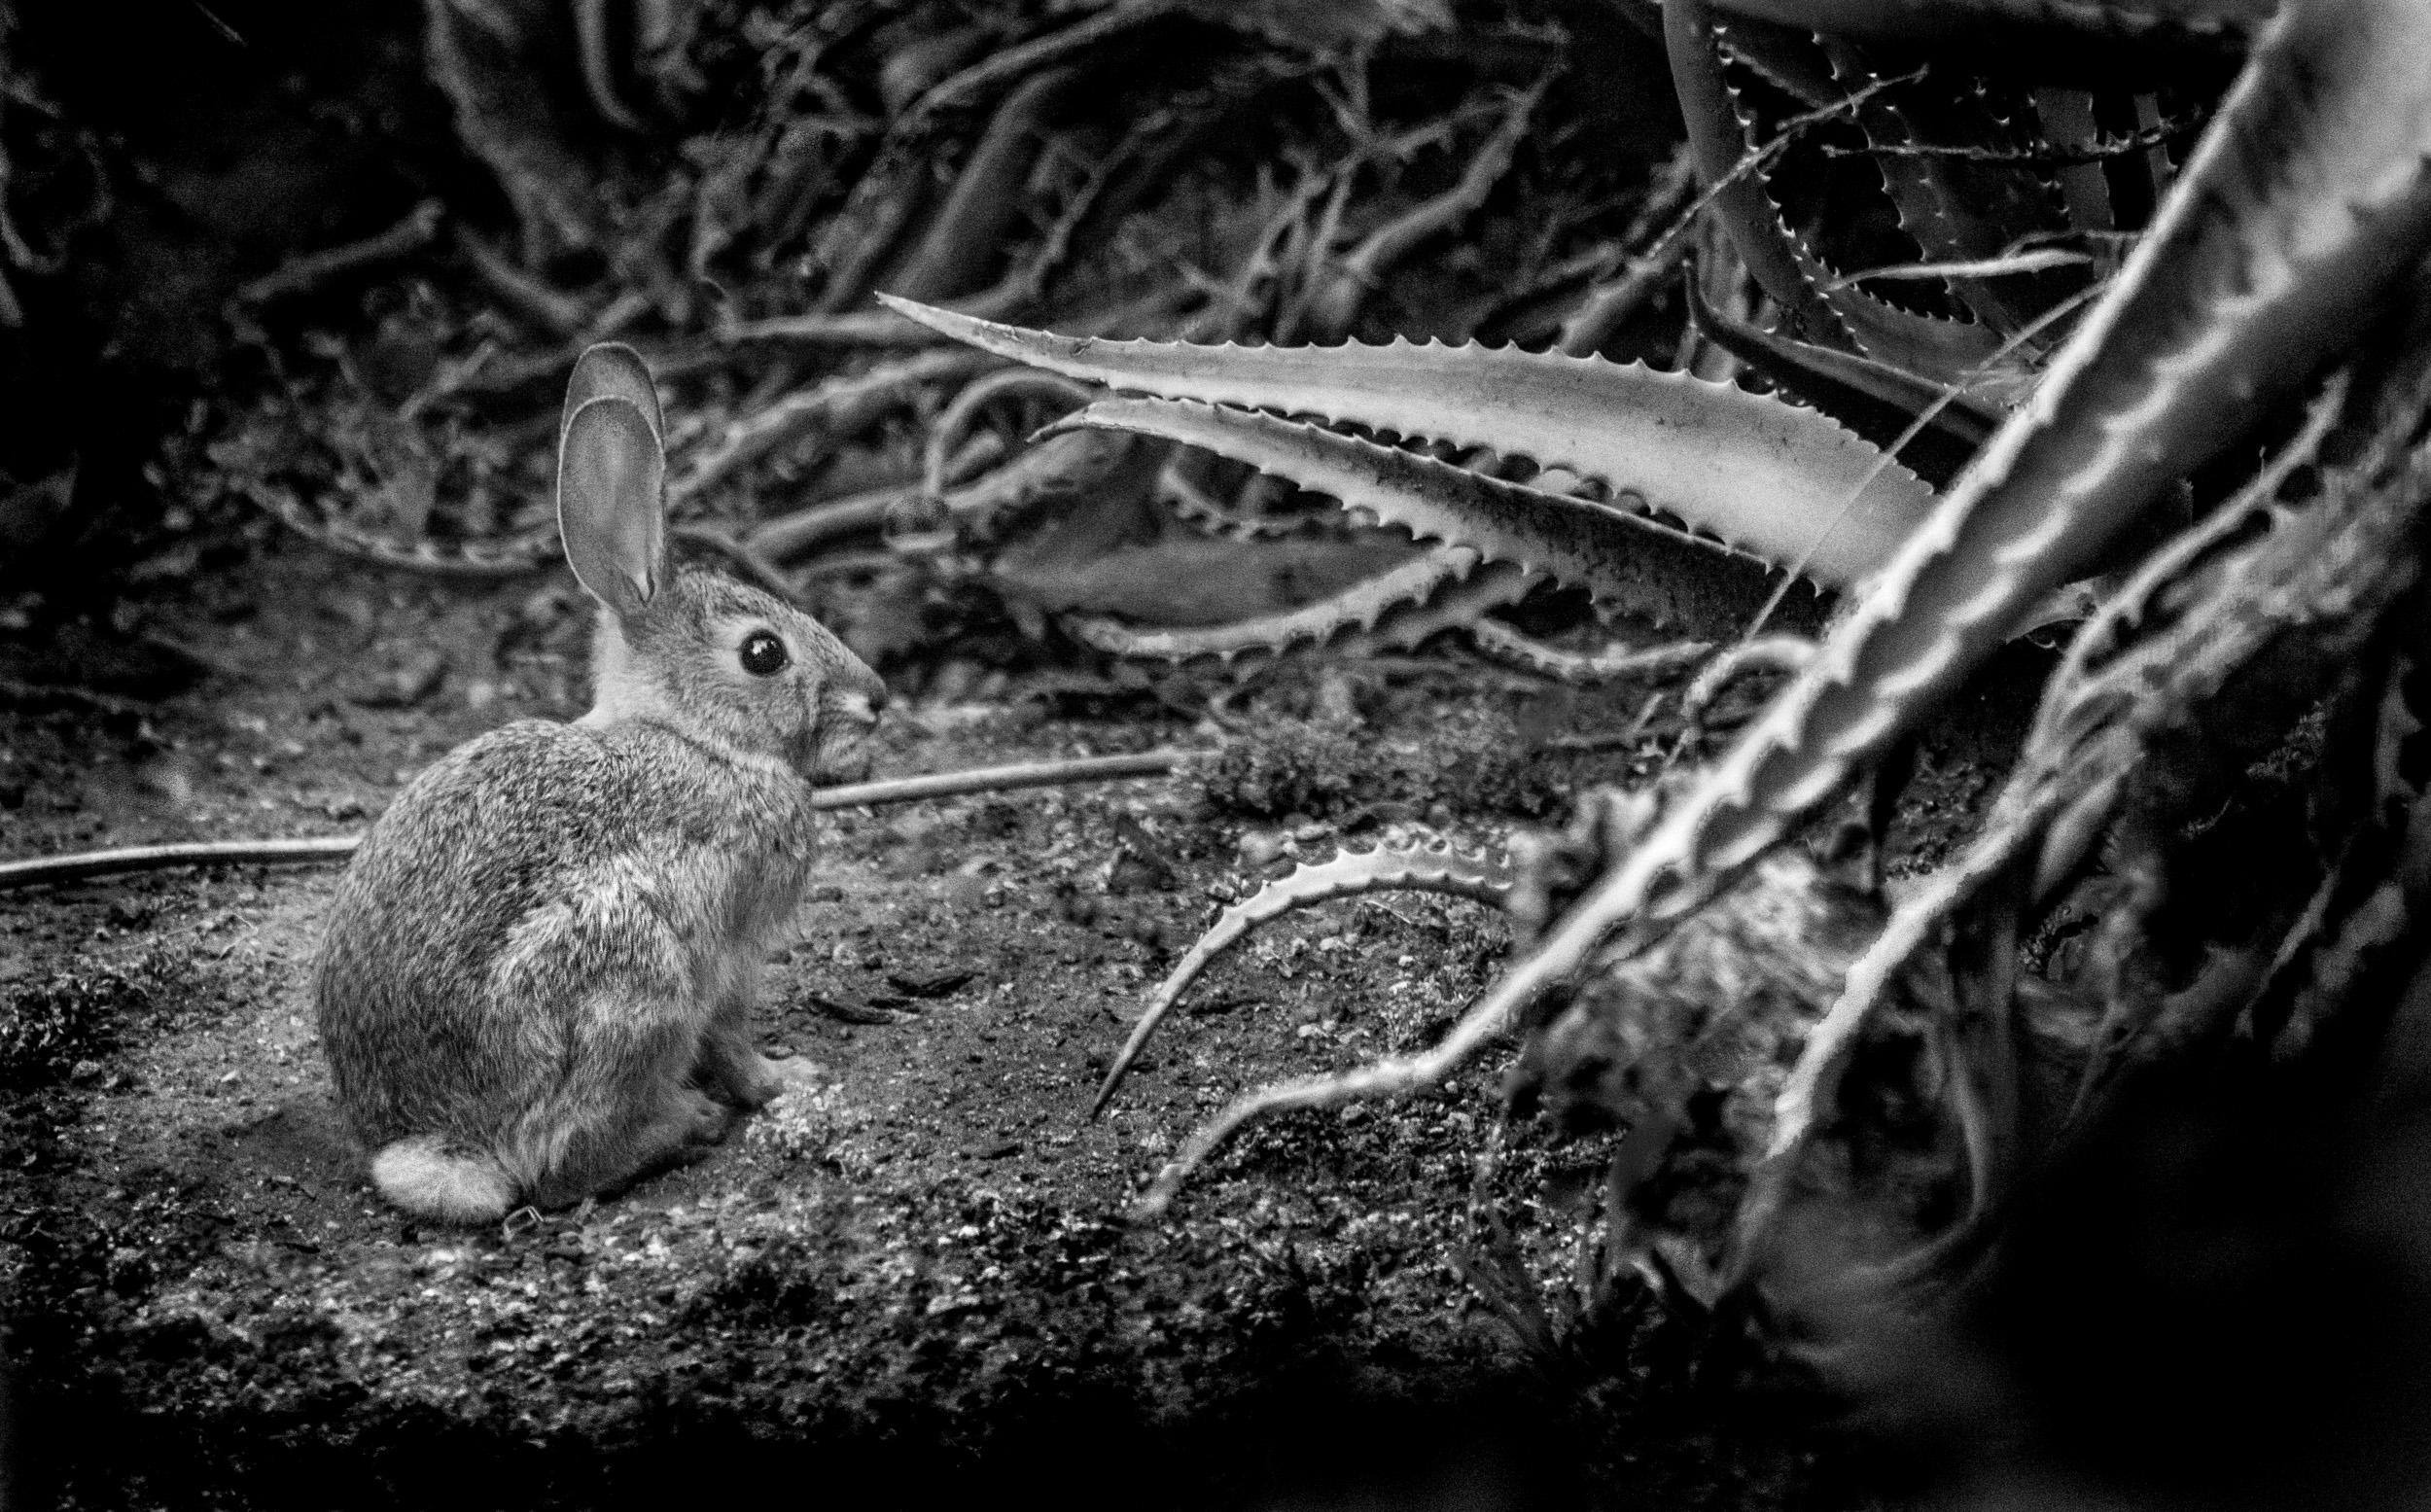 Hare at the Huntington Library, San Marino, California © Robert Welkie 2017